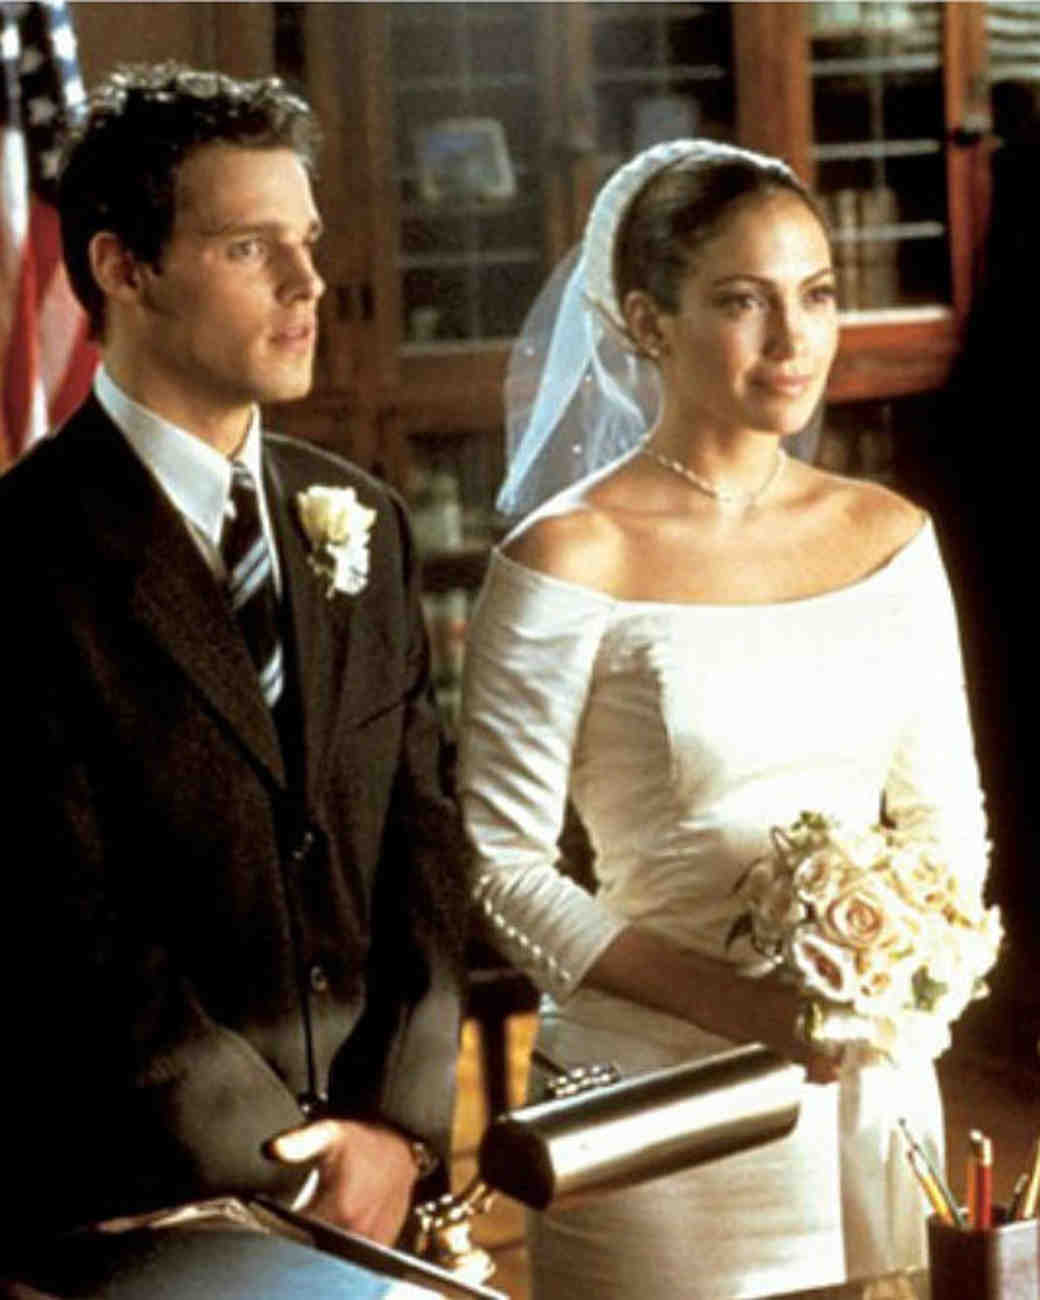 movie-wedding-dresses-the-wedding-planner-jennifer-lopez-0316.jpg